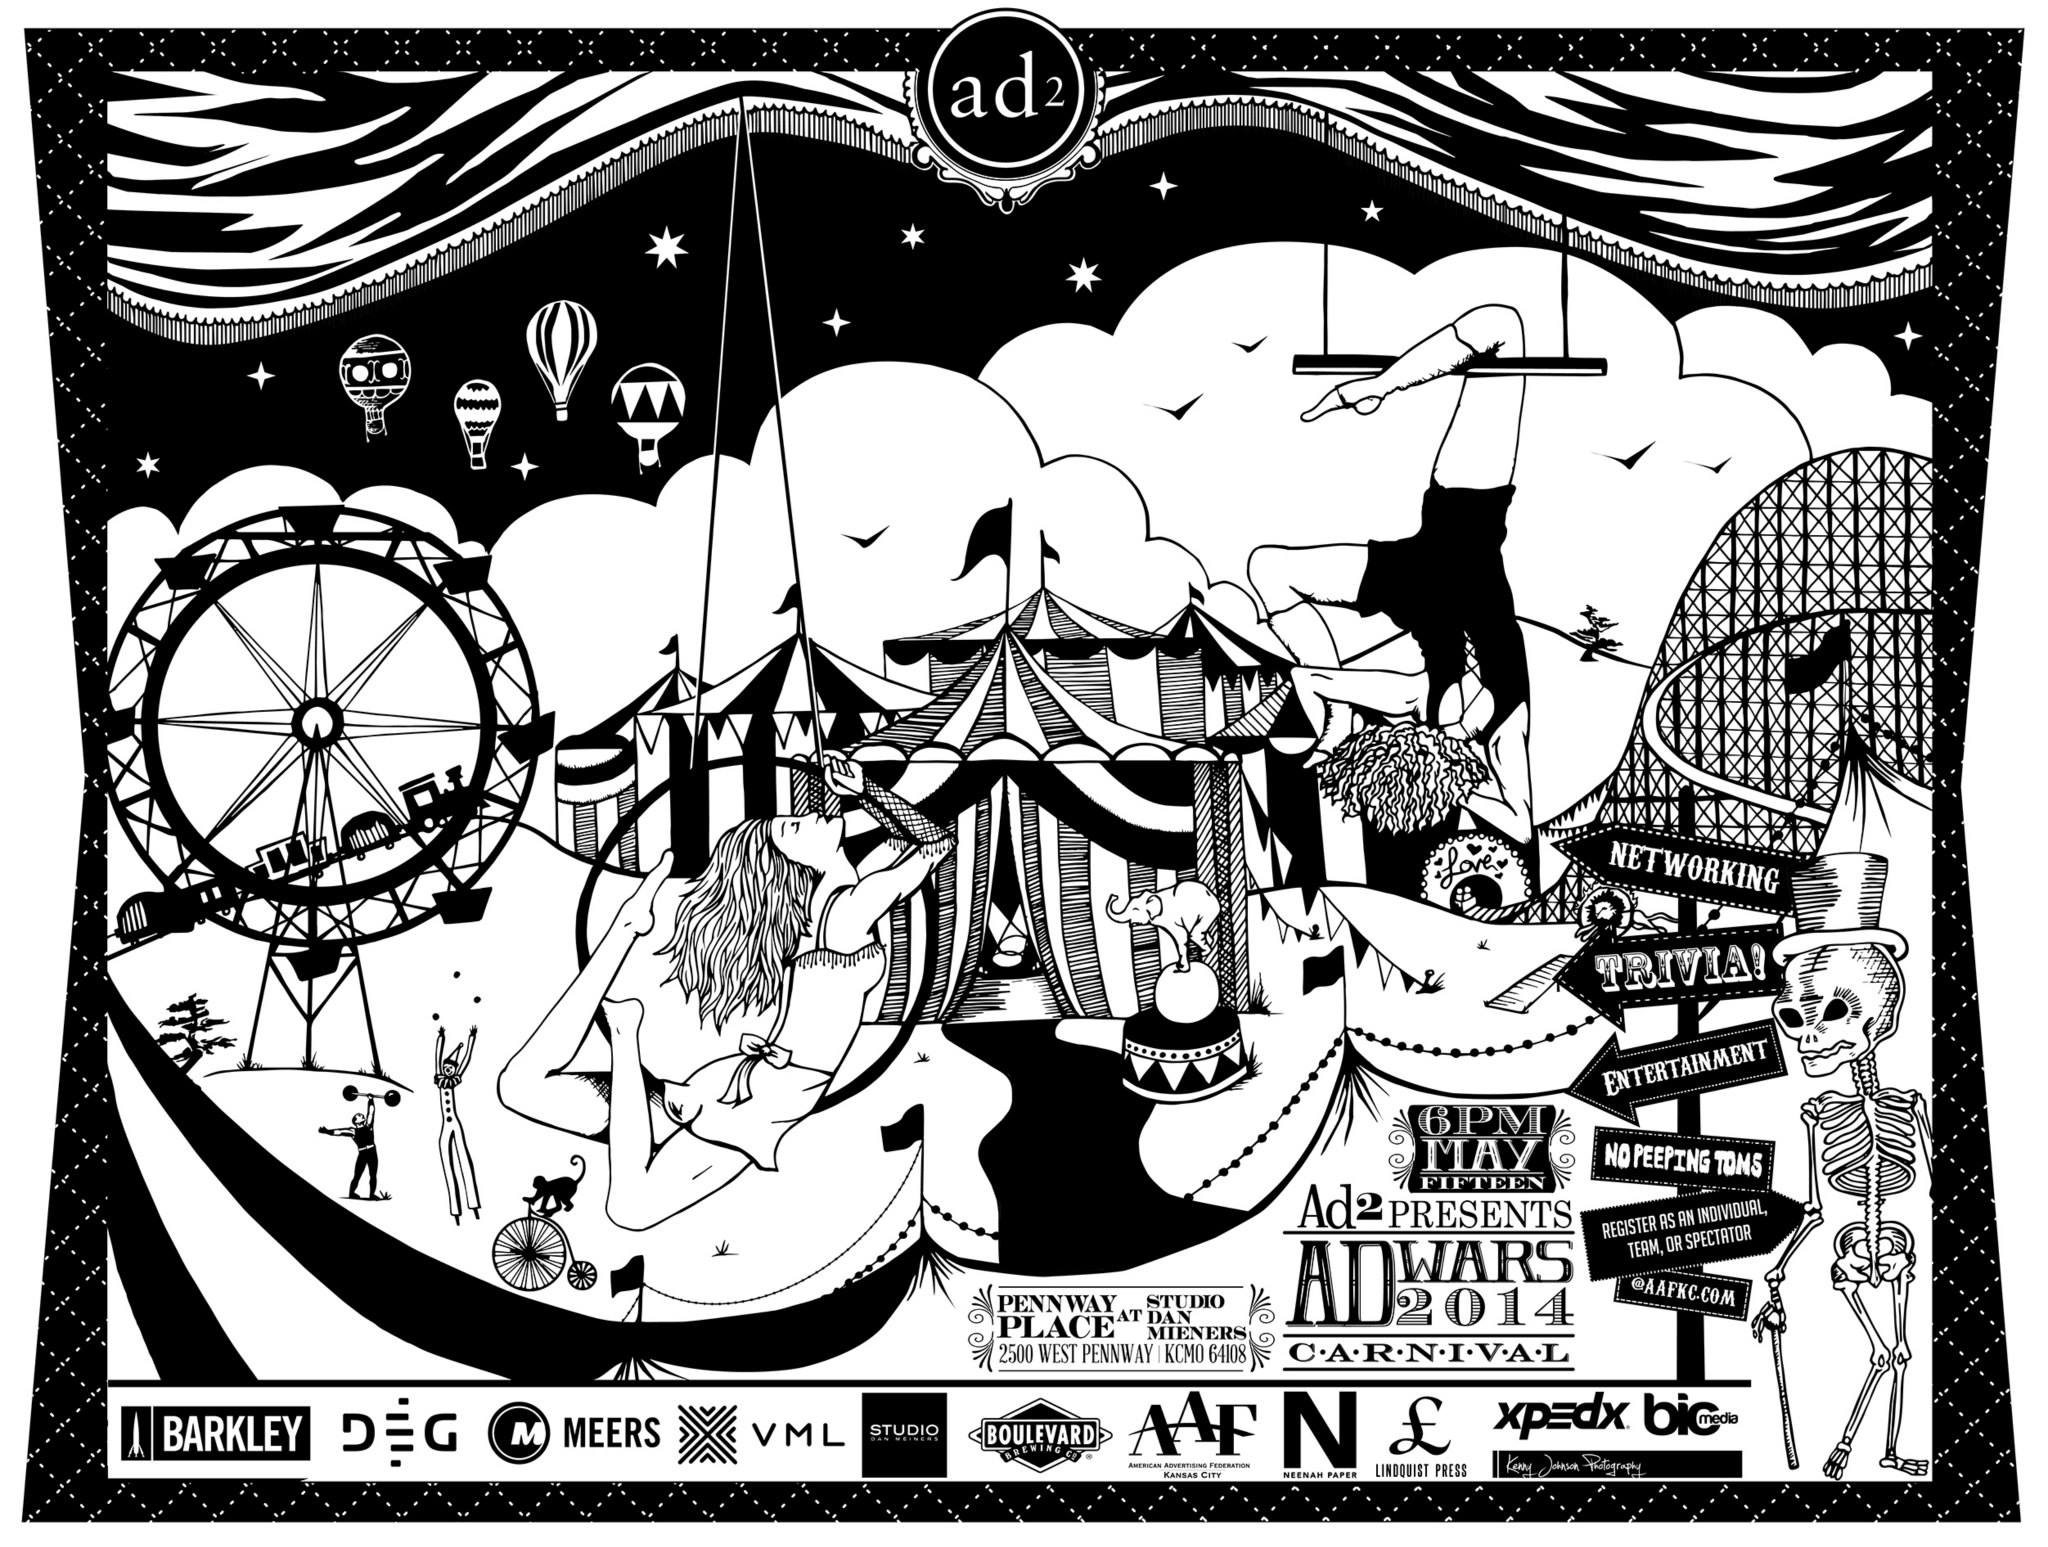 Ad Wars 2014 Letterpress Poster